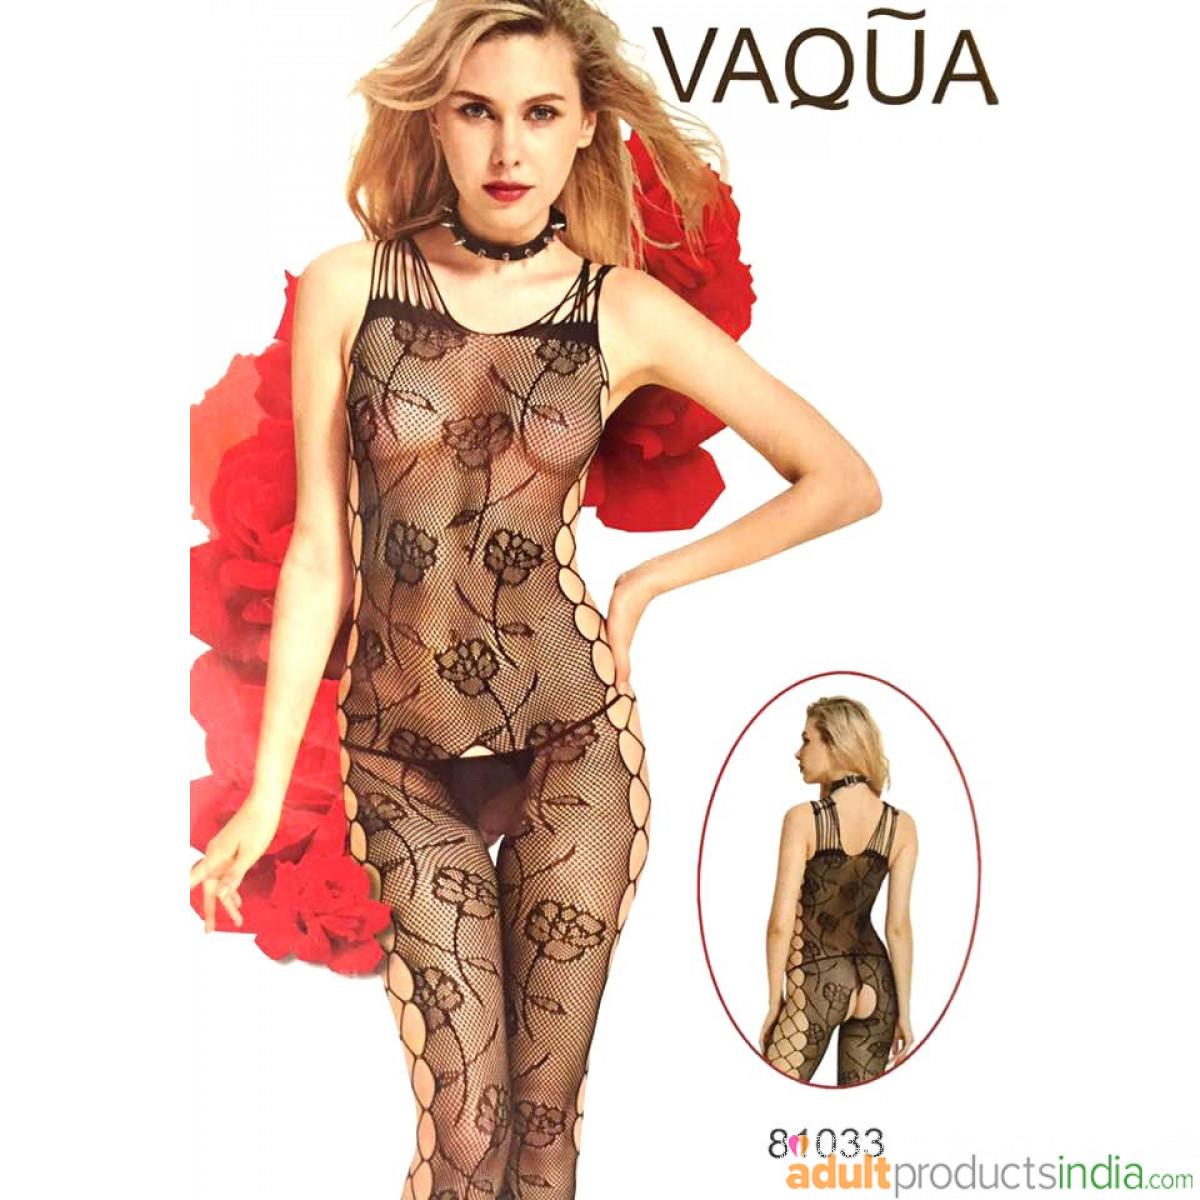 VAQUA Bodystocking No. 81033